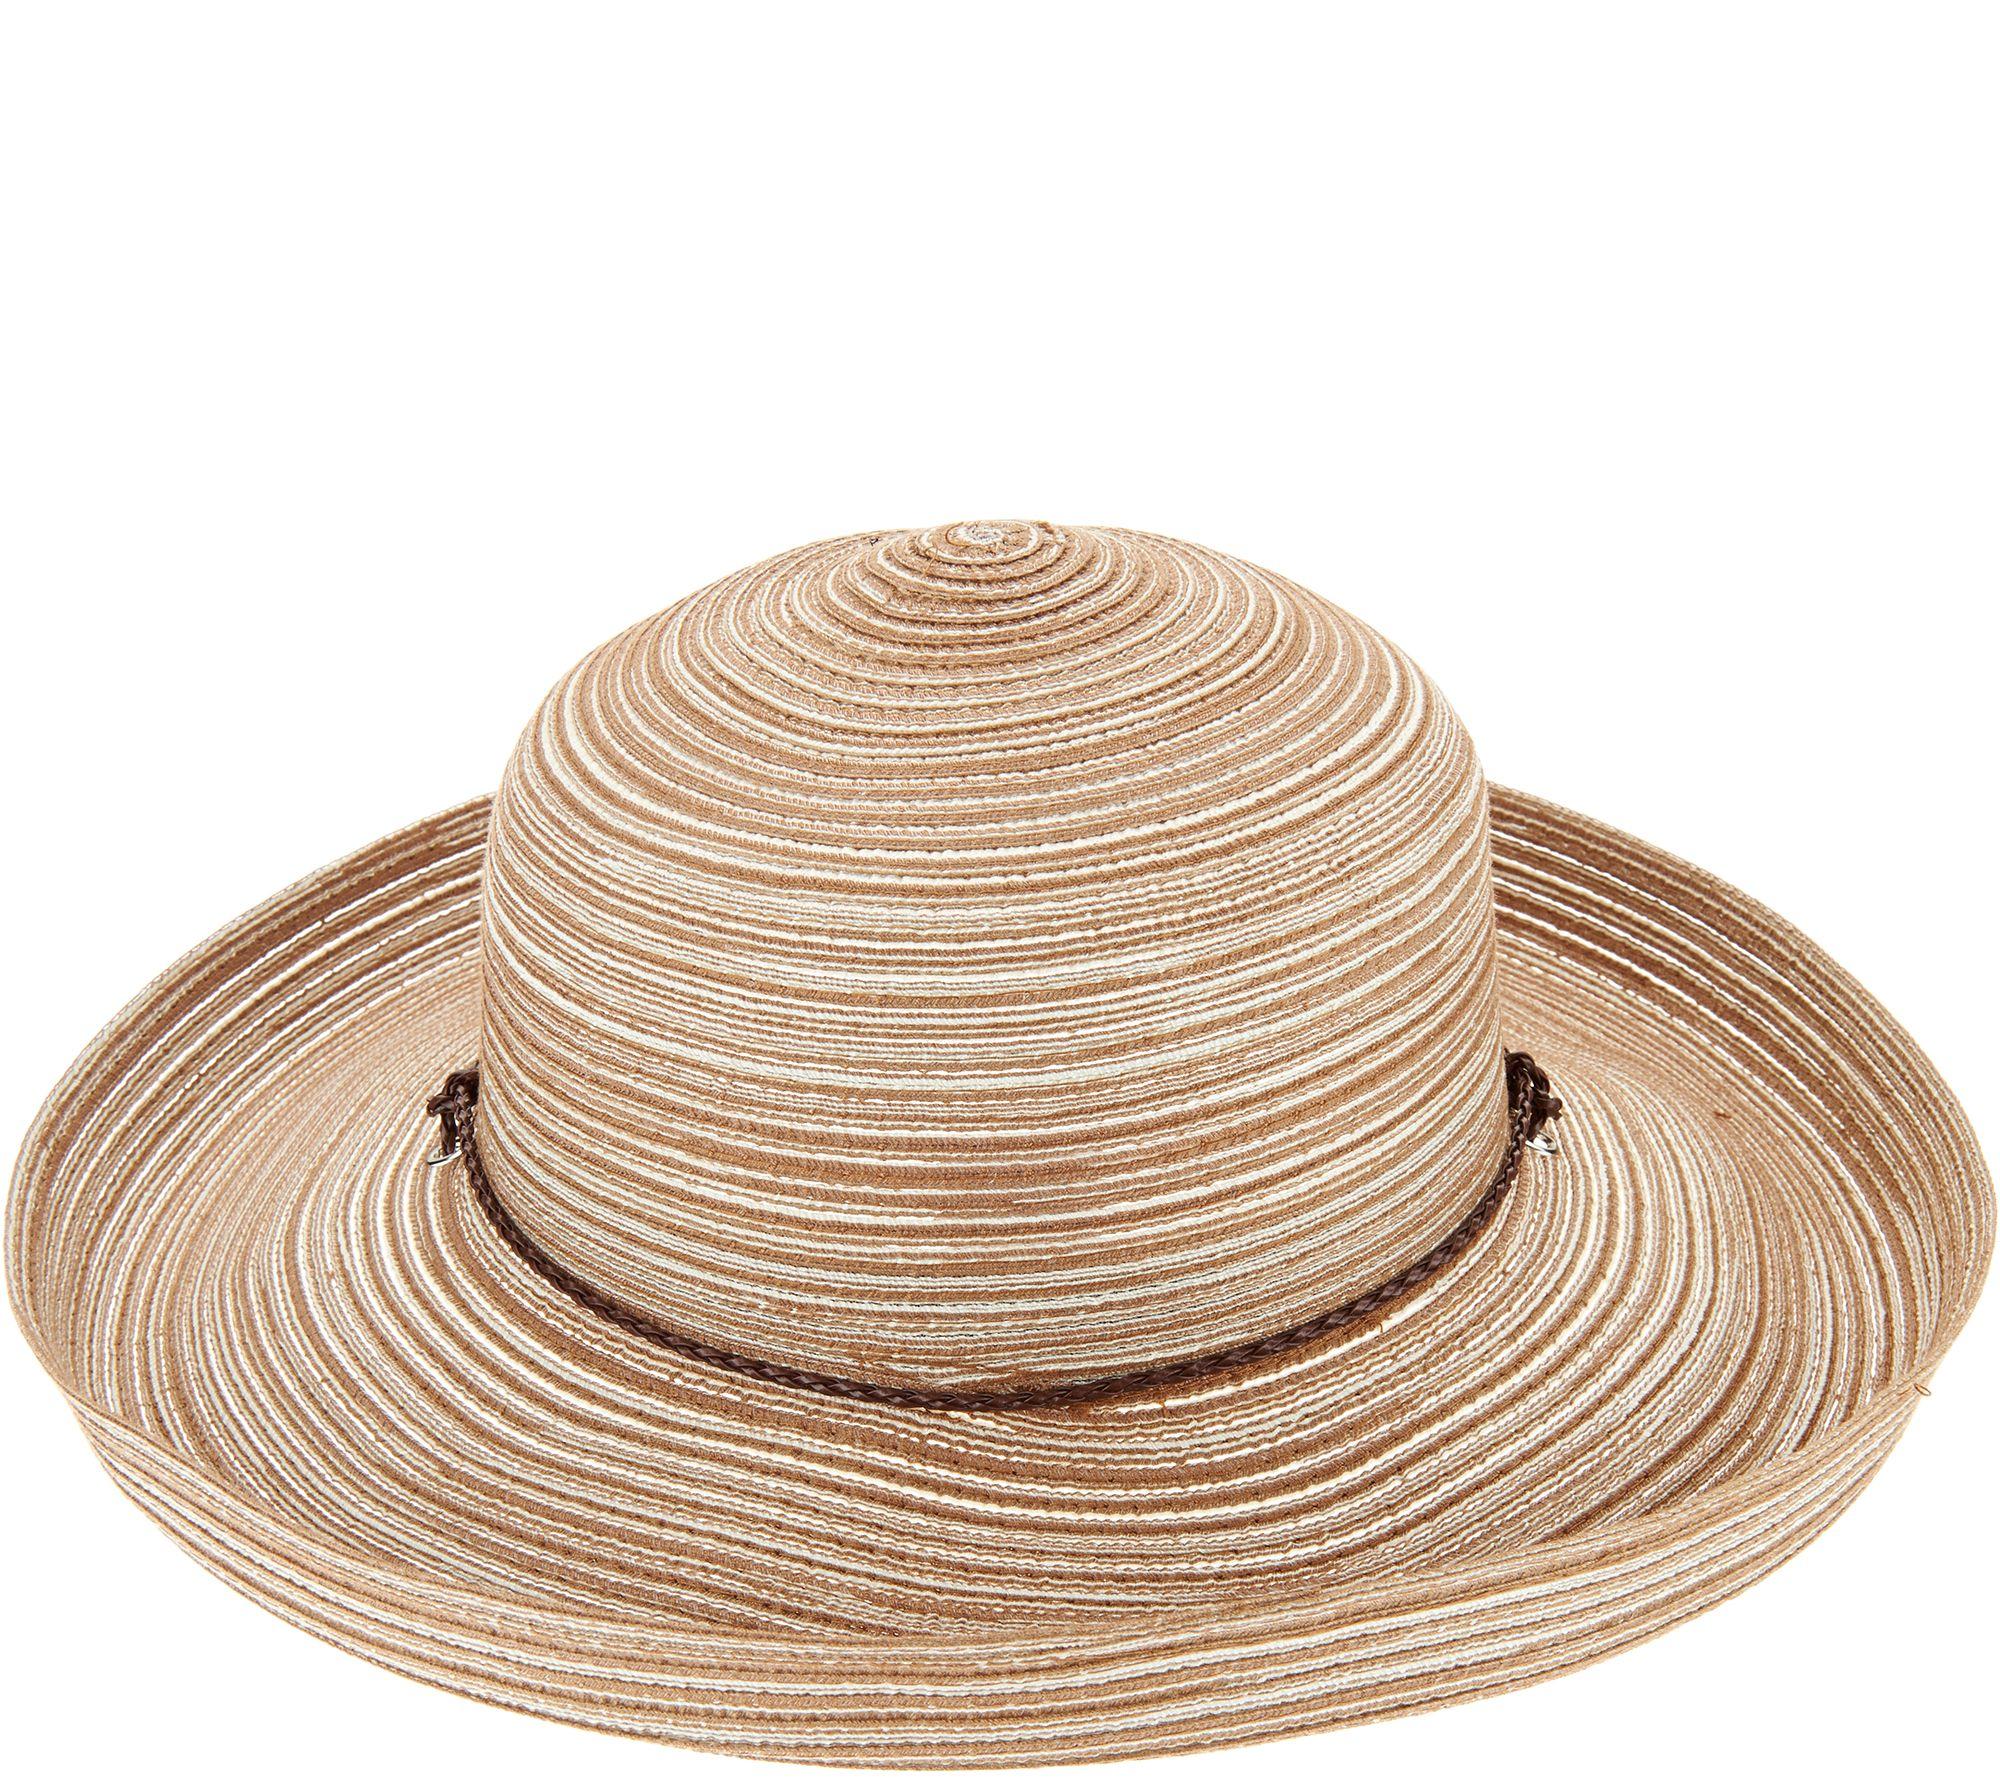 6481f68290cf3 San Diego Hat Co. Mixed Braid Kettle Brim Sun Hat - Page 1 — QVC.com